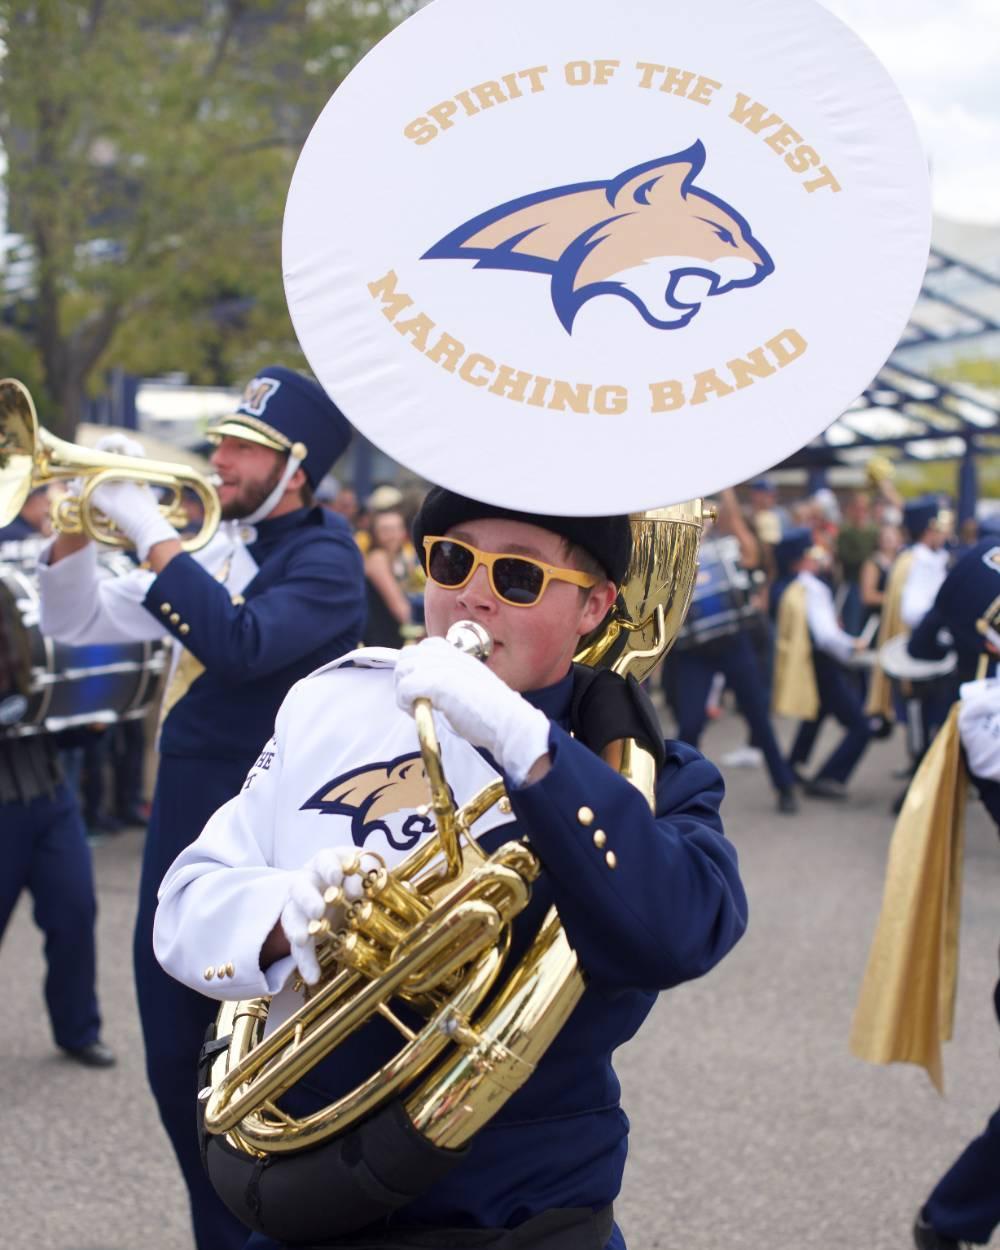 Spirit of the West - School of Music | Montana State University